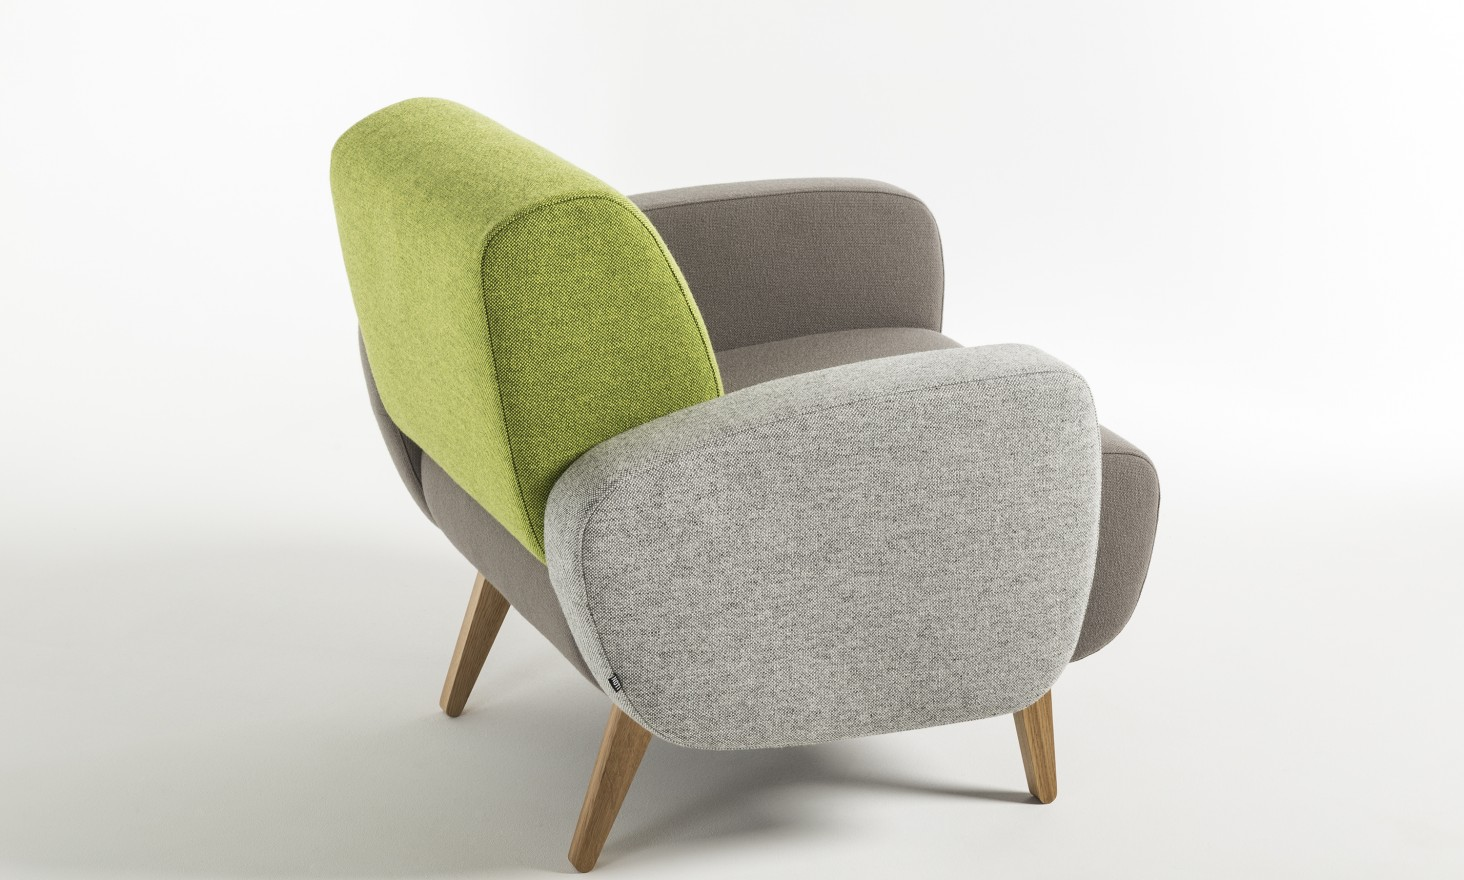 TEDDY_BEAR_packshot_armchair 1